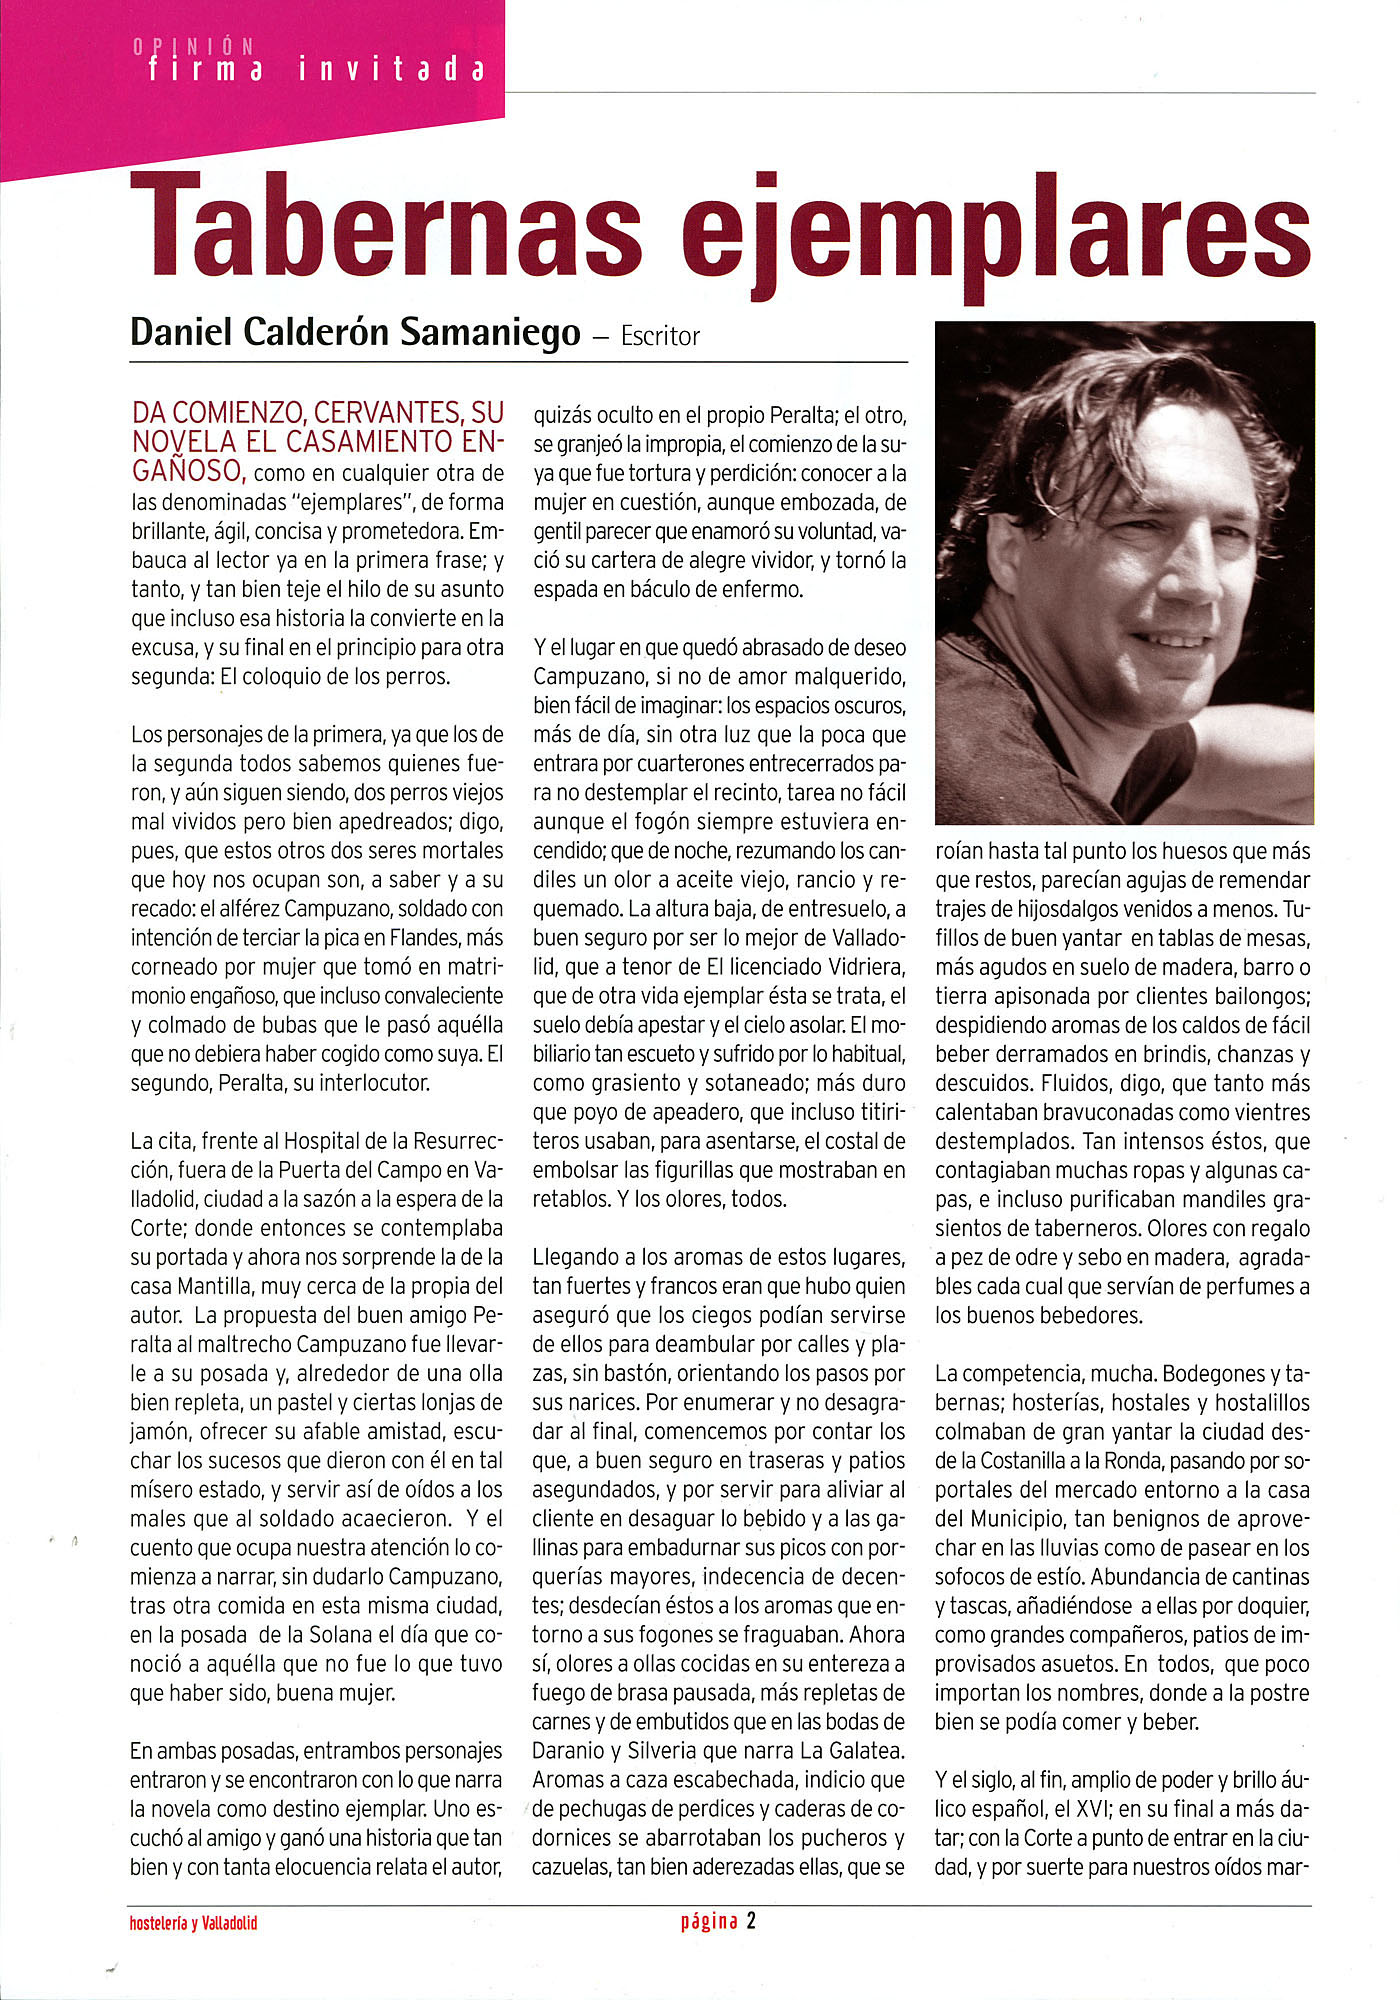 danielvillalobos-calderonsamaniego-shortstory-spanishliterature.2